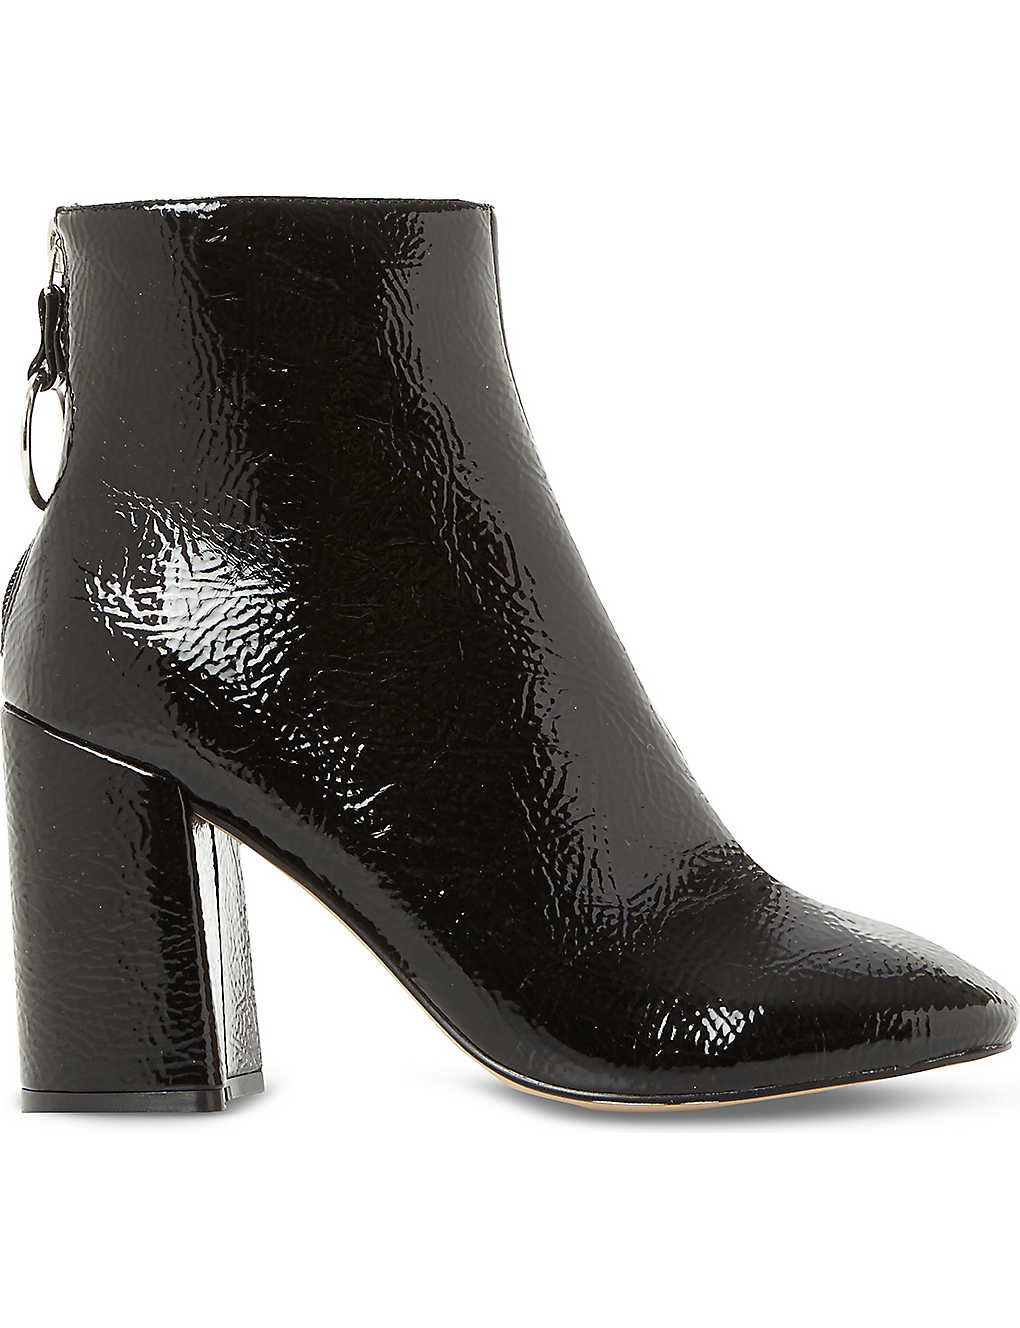 2ecc6321e3c STEVE MADDEN - Posed patent-effect heeled ankle boots | Selfridges.com